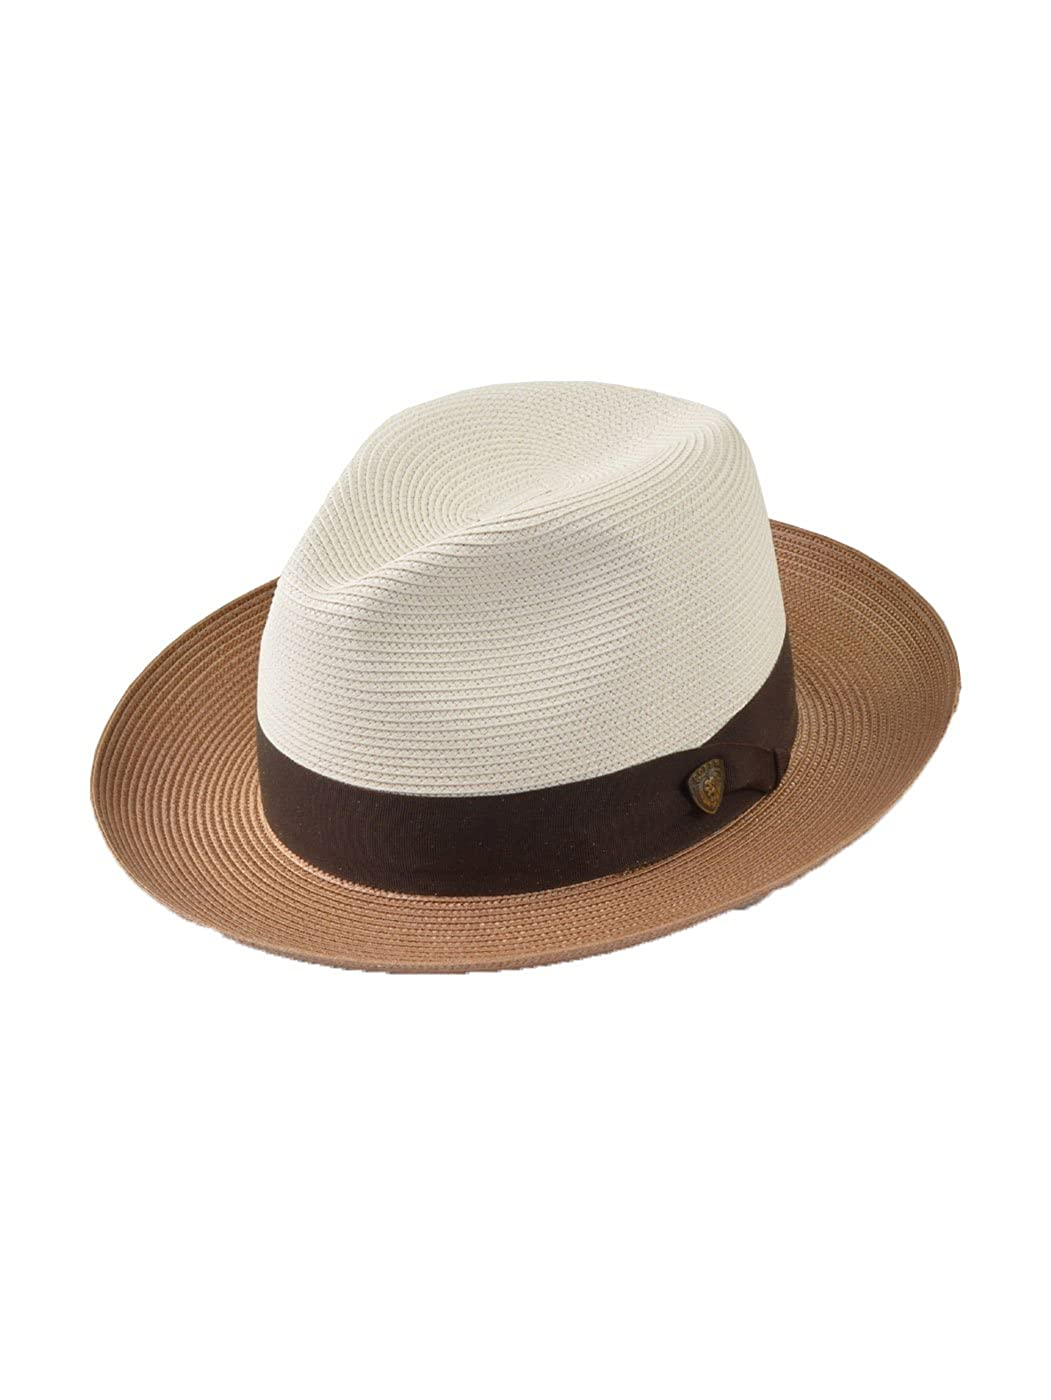 62727adb538 Stetson & Dobbs DSTLDO Men's Toledo Straw Hat at Amazon Men's Clothing  store: